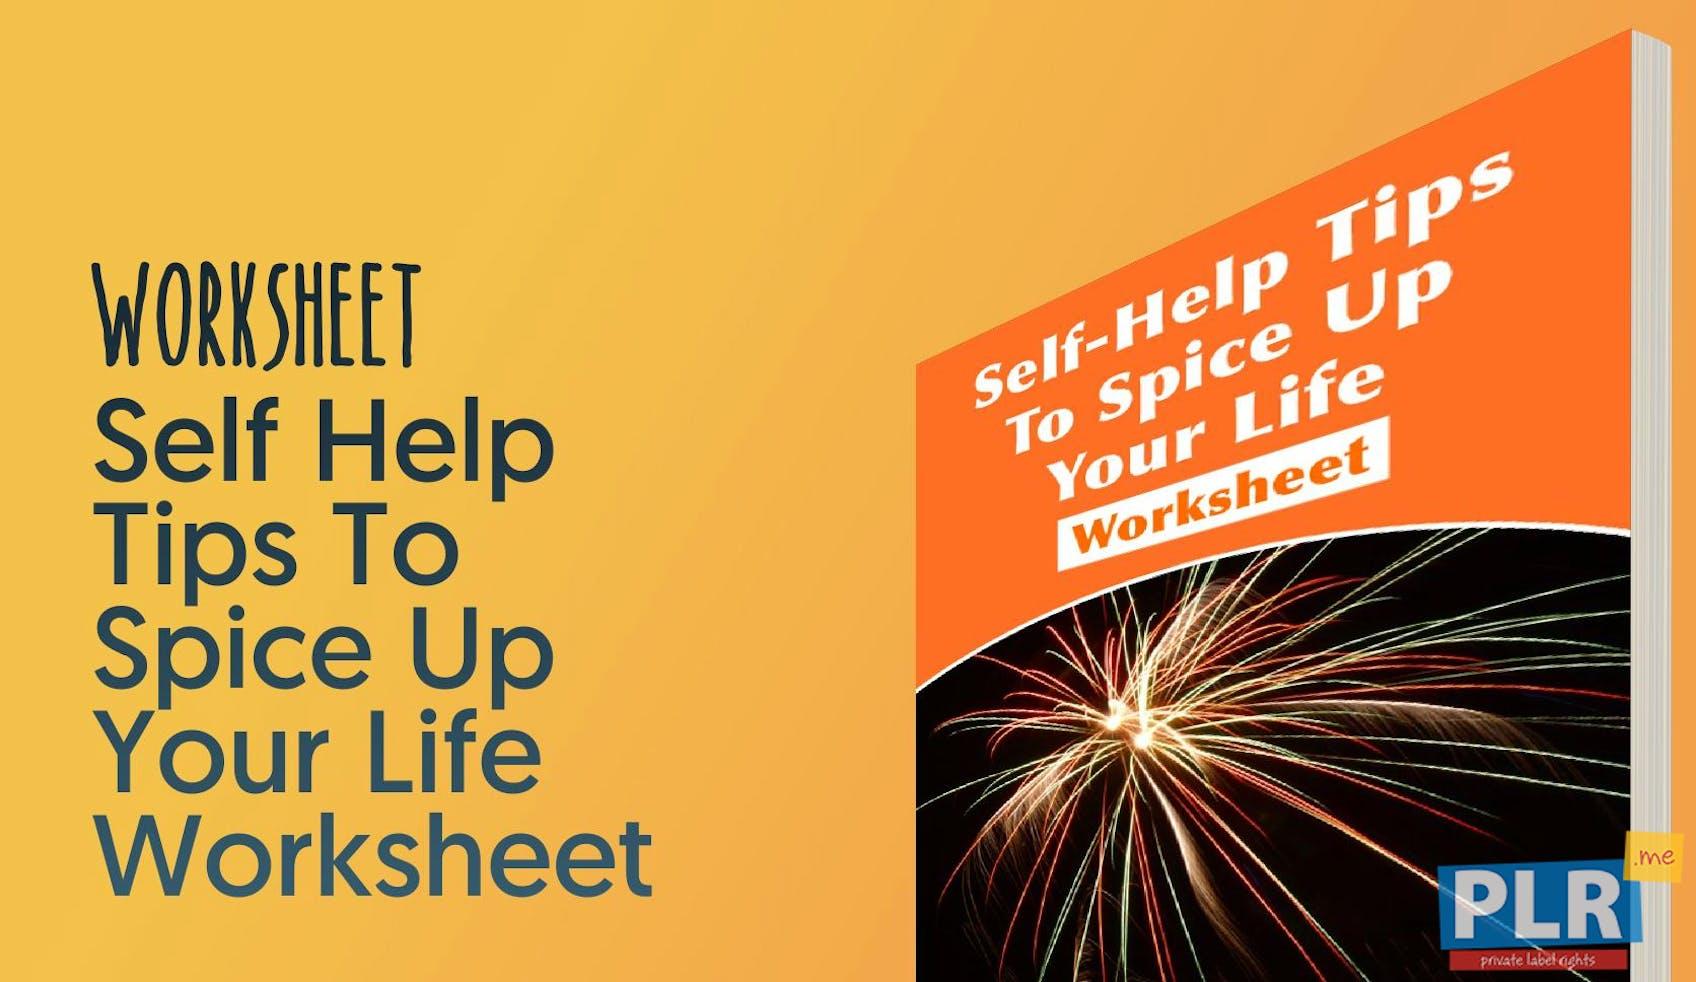 Plr Worksheets Self Help Tips To Spice Up Your Life Worksheet Plr